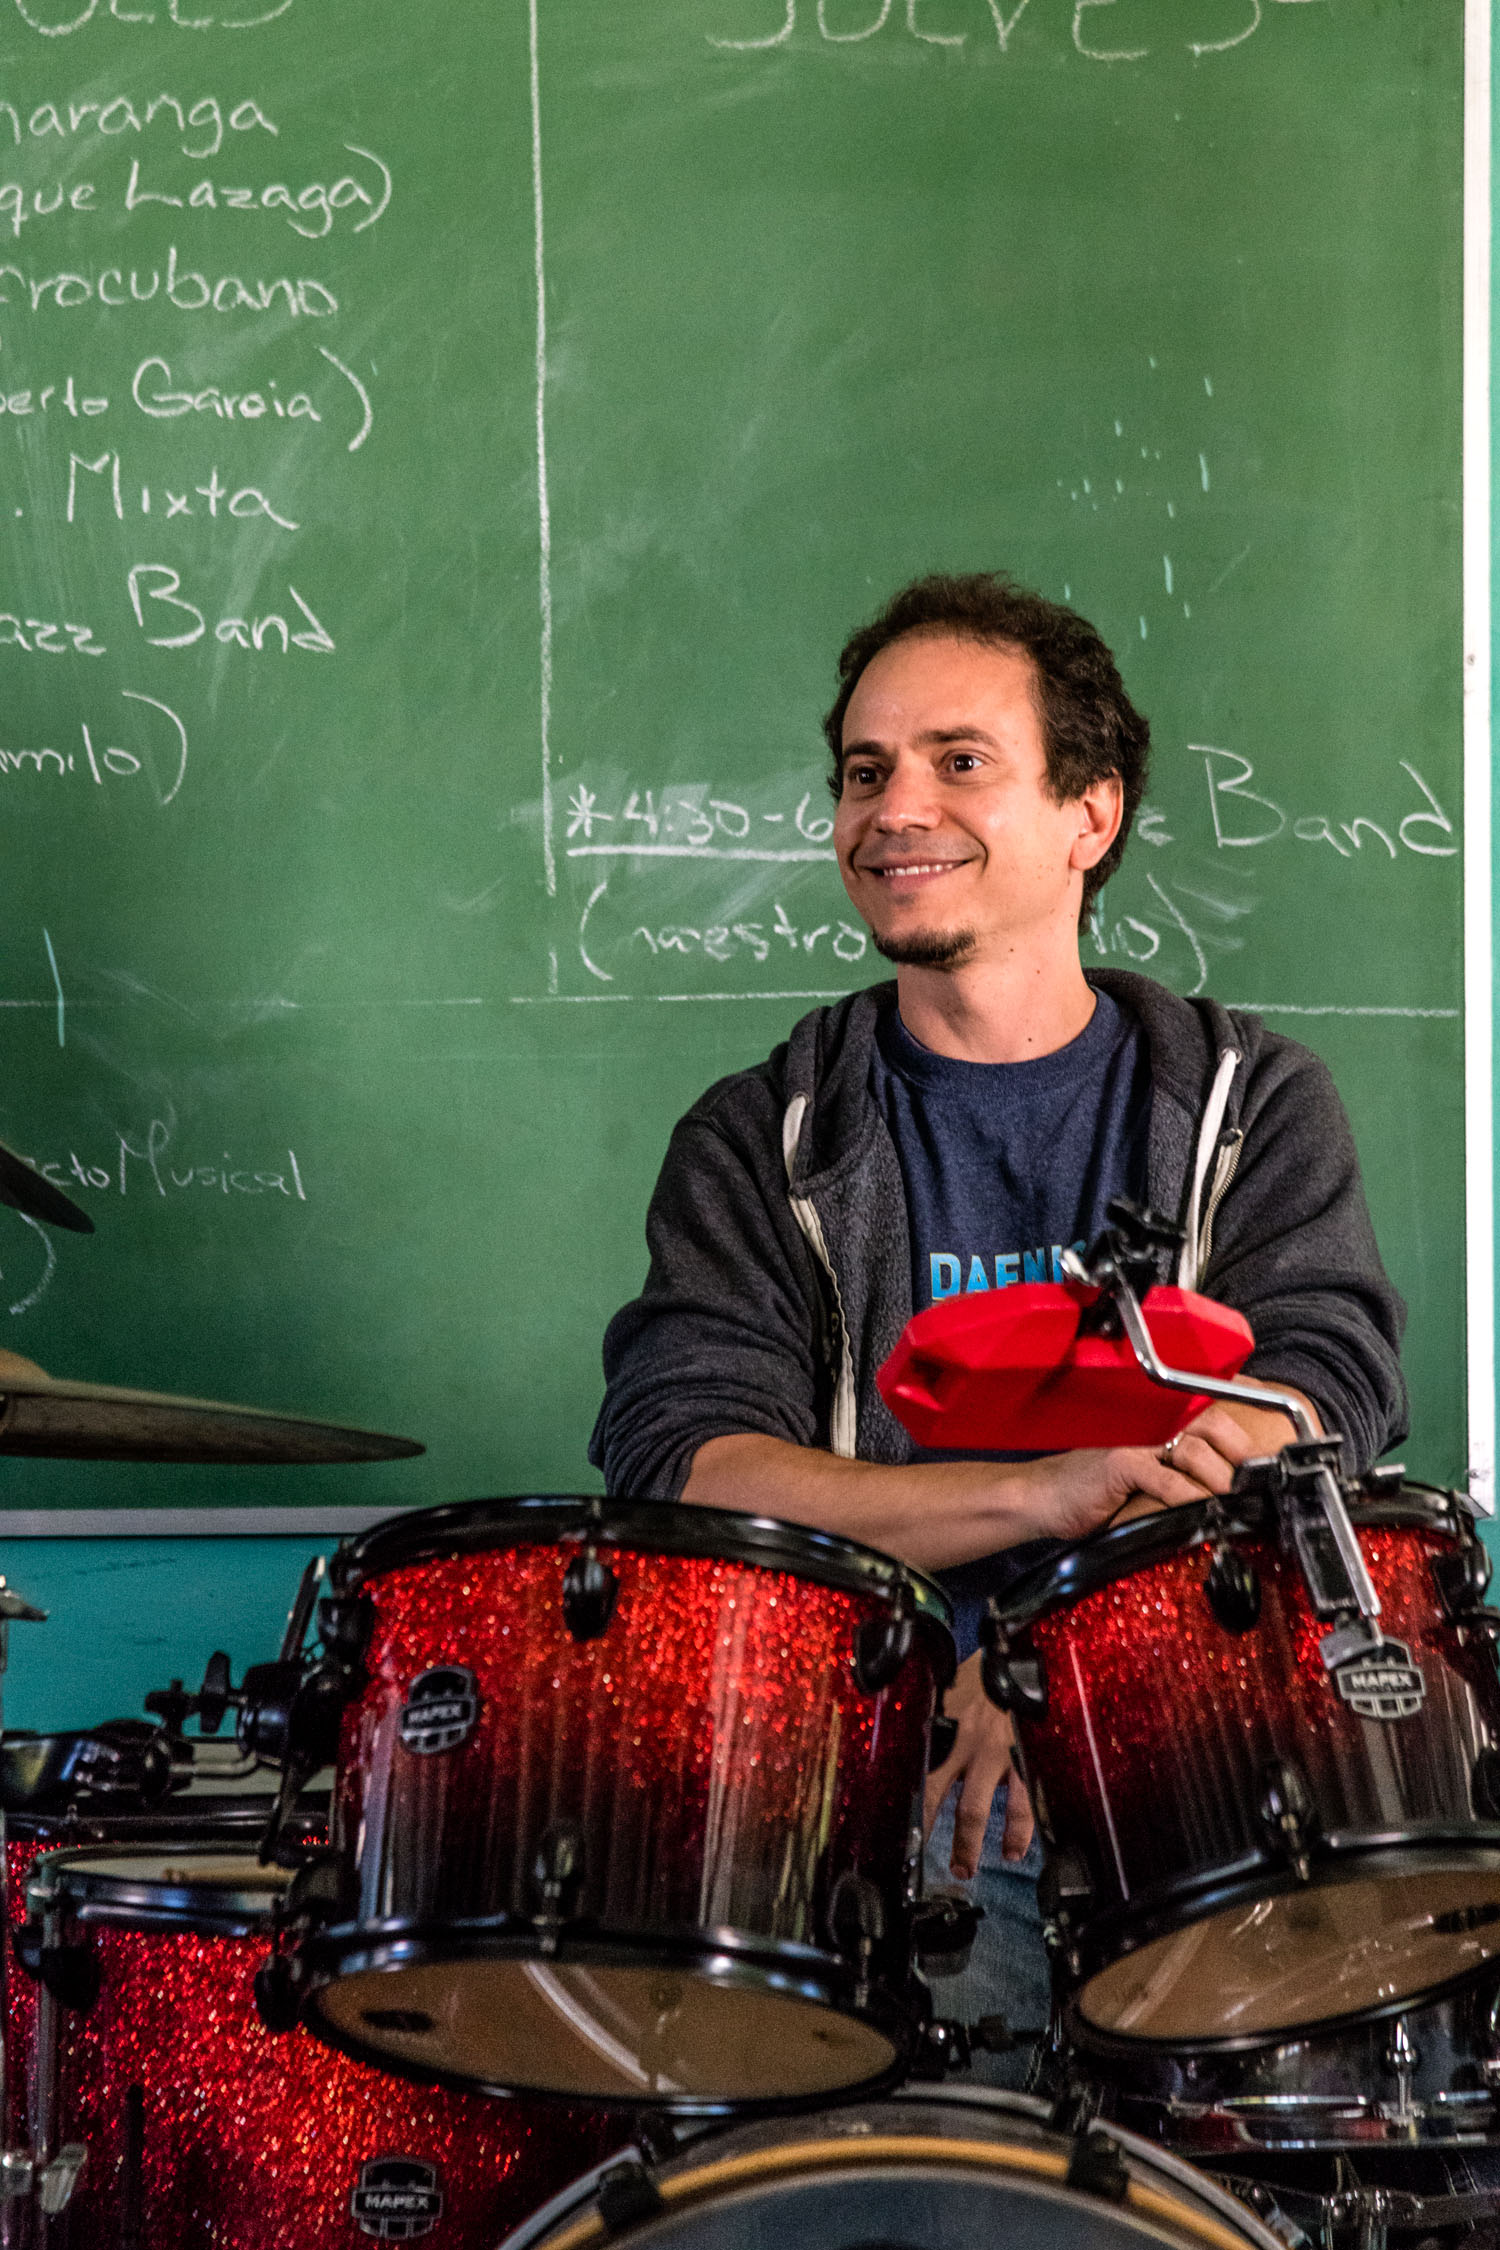 Dafnis Prieto teaching at Escuela Nacional de Arte (La ENA), Havana, Cuba, January 2019 (Photo by David Garten)